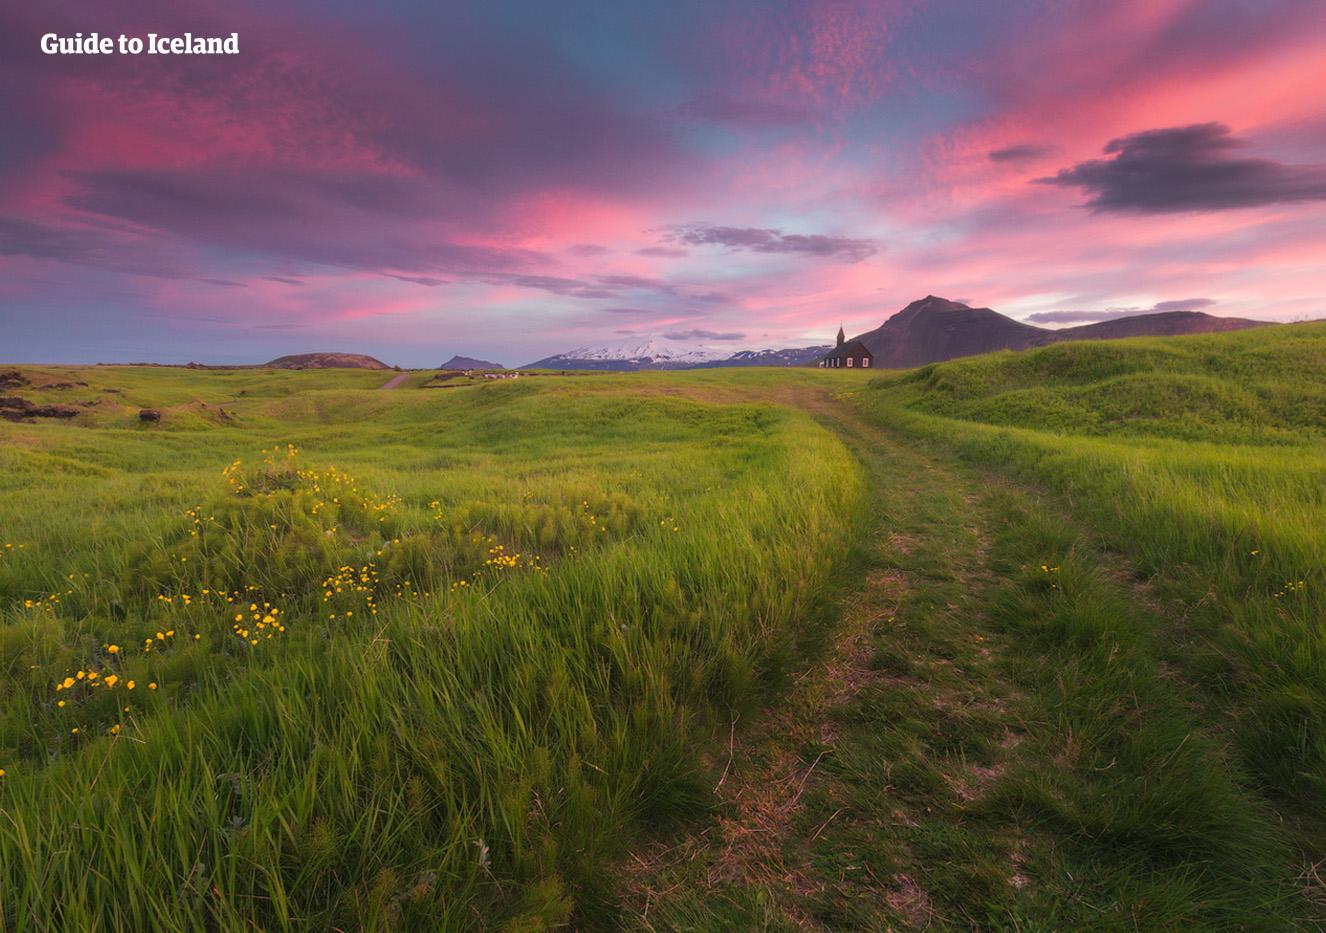 En vej på Snæfellsnes-halvøen fører til kirken i Buðir og fortsætter til Snæfellsjökull-gletsjeren.